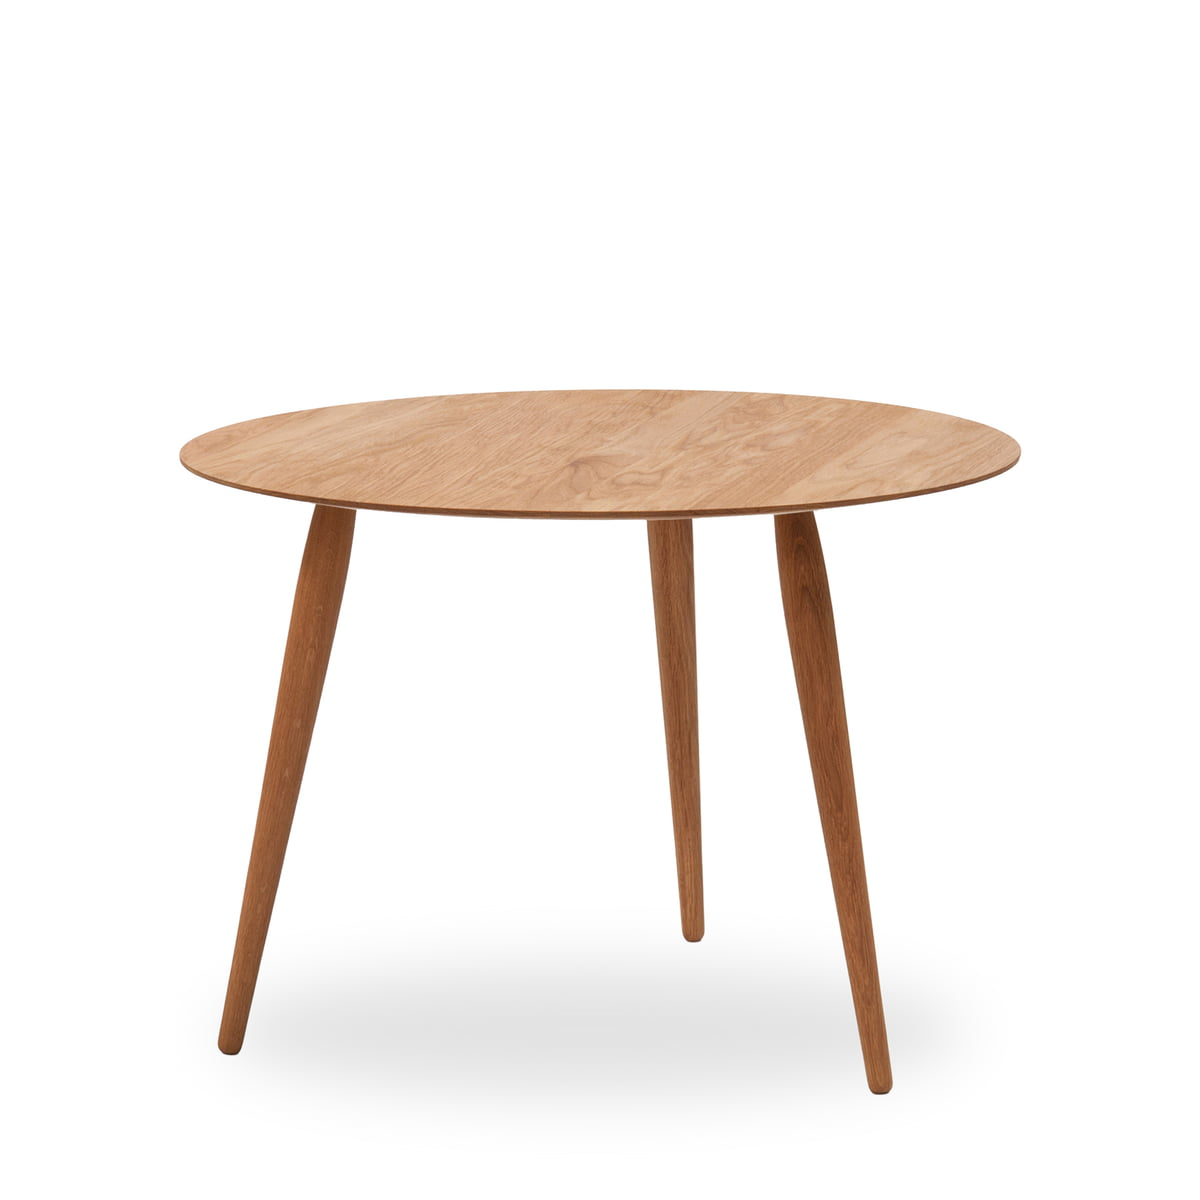 Playround Coffee Table By Bruunmunch Online